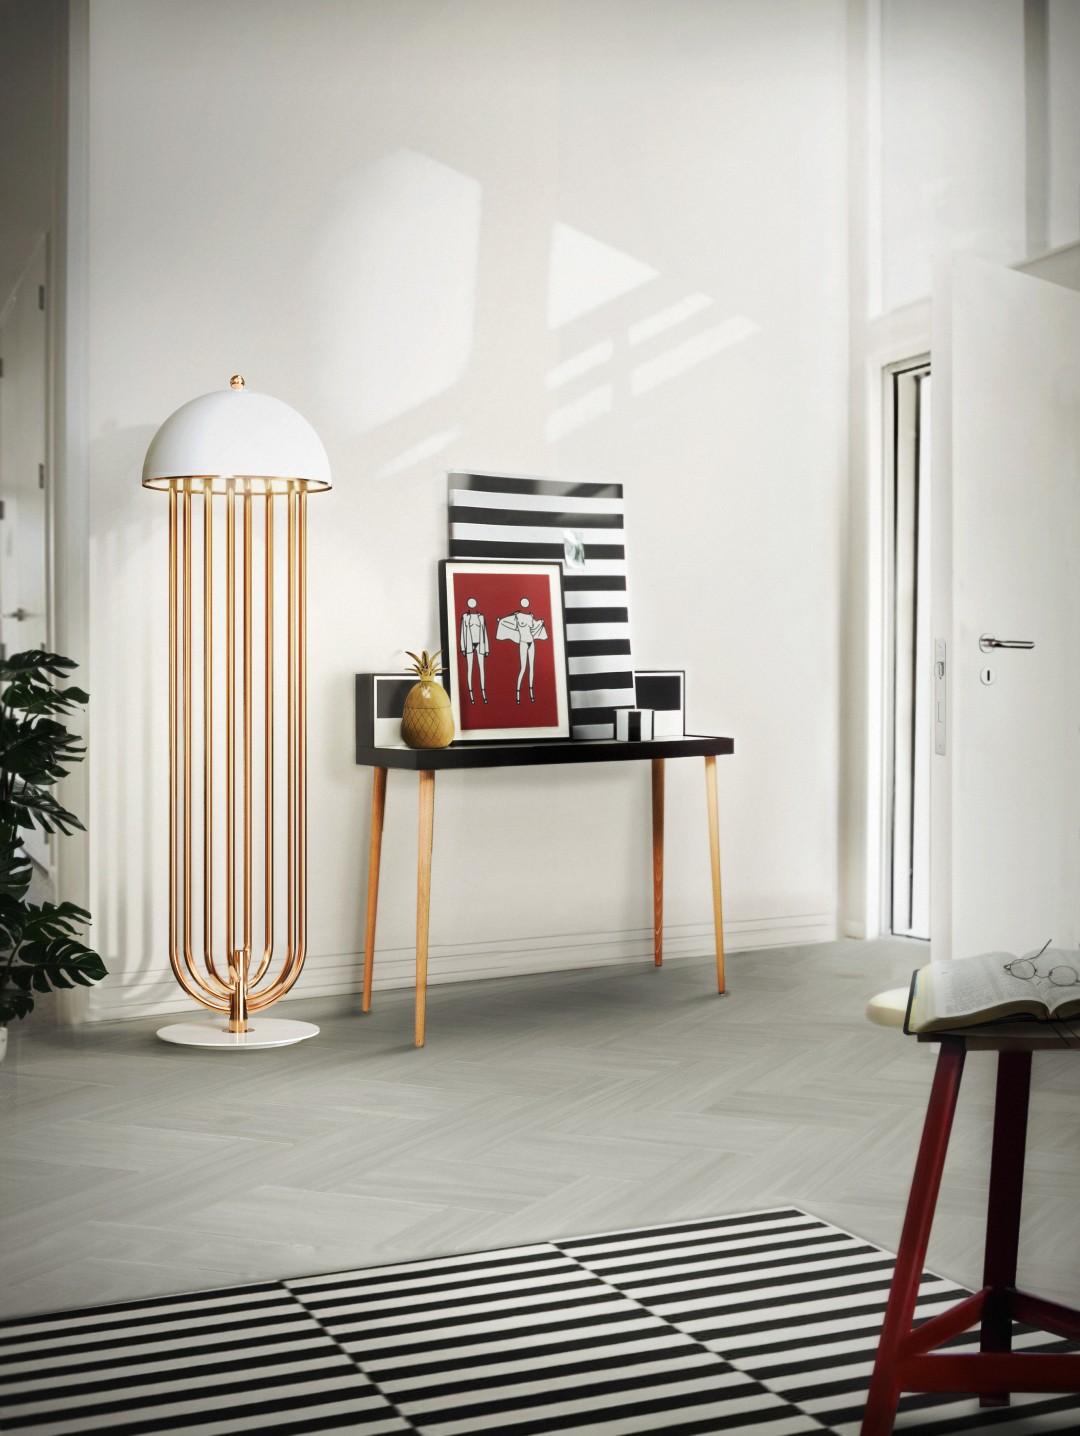 MID-CENTURY LIGHTING A Yunakov Design Project That Features Mid-Century Lighting! A Yunakov Design Project That Features Mid Century Lighting 5